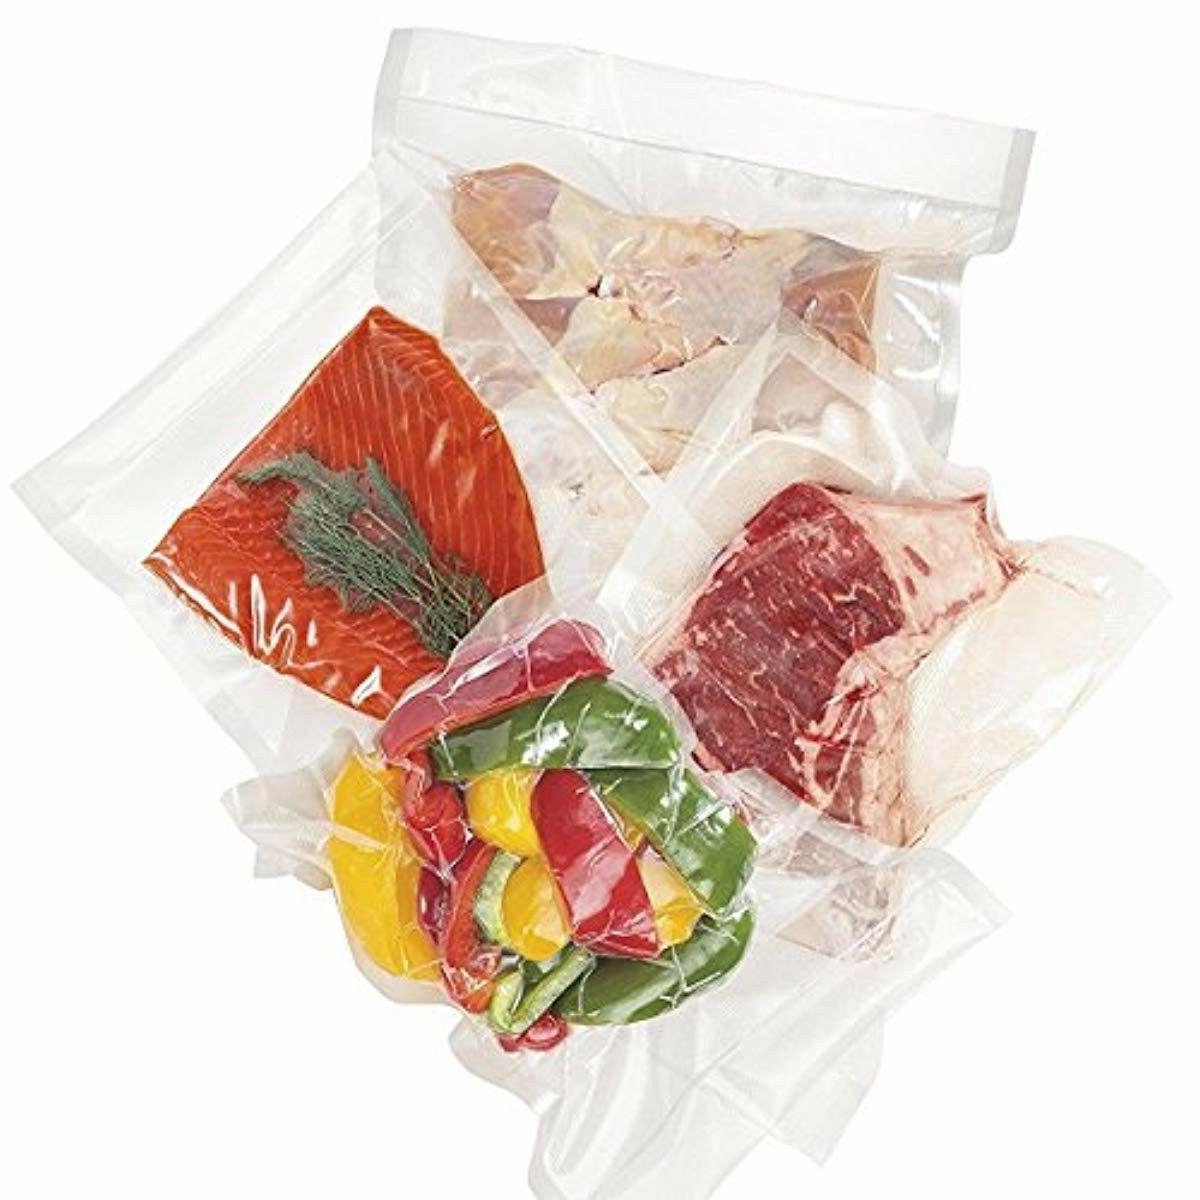 Hamilton-Beach-NutriFresh-Heat-Vacuum-Sealer-30-Quart-Bags-